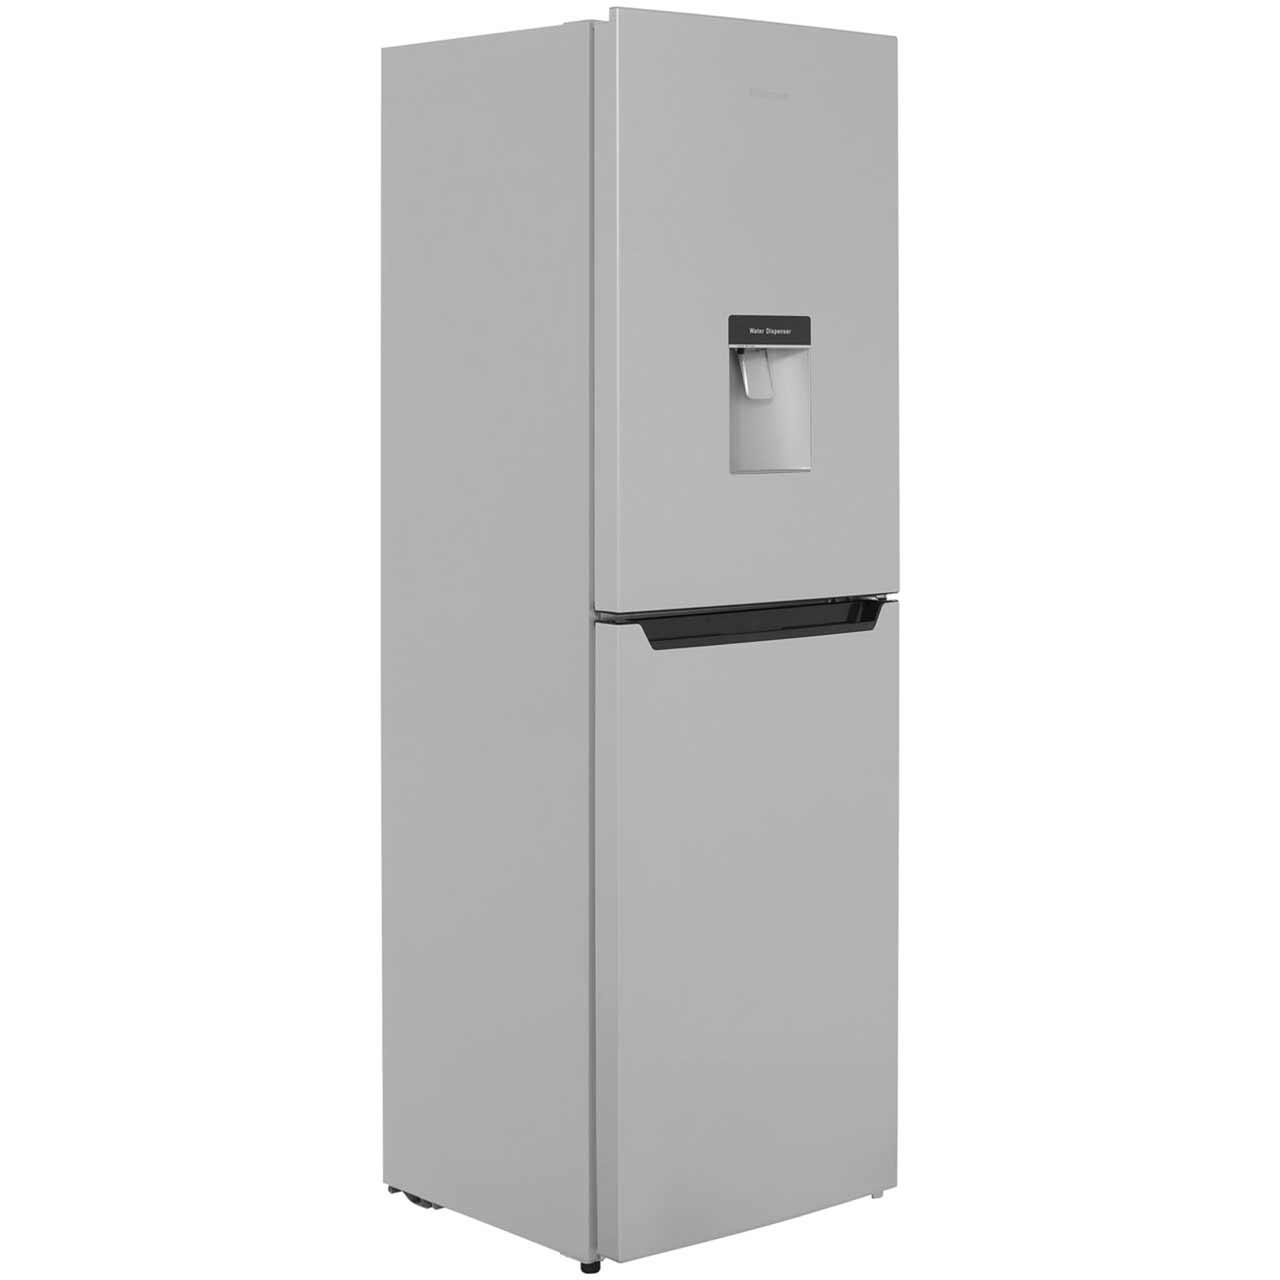 Hisense Rb320d4wg1 A Fridge Freezer 50 50 Free Standing